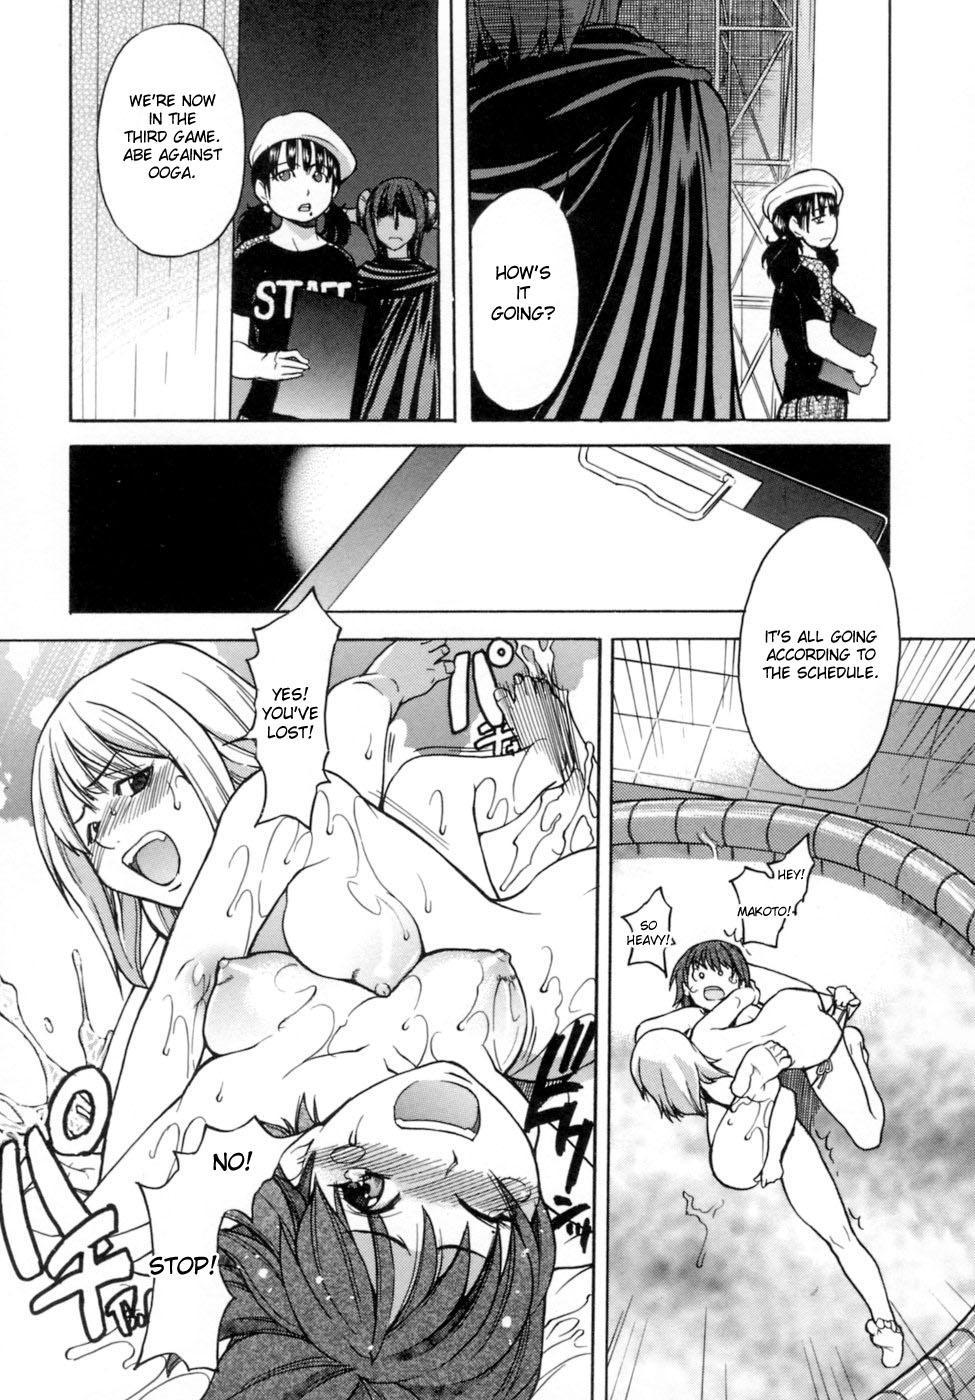 Shining Musume. 5. Five Sense of Love 16